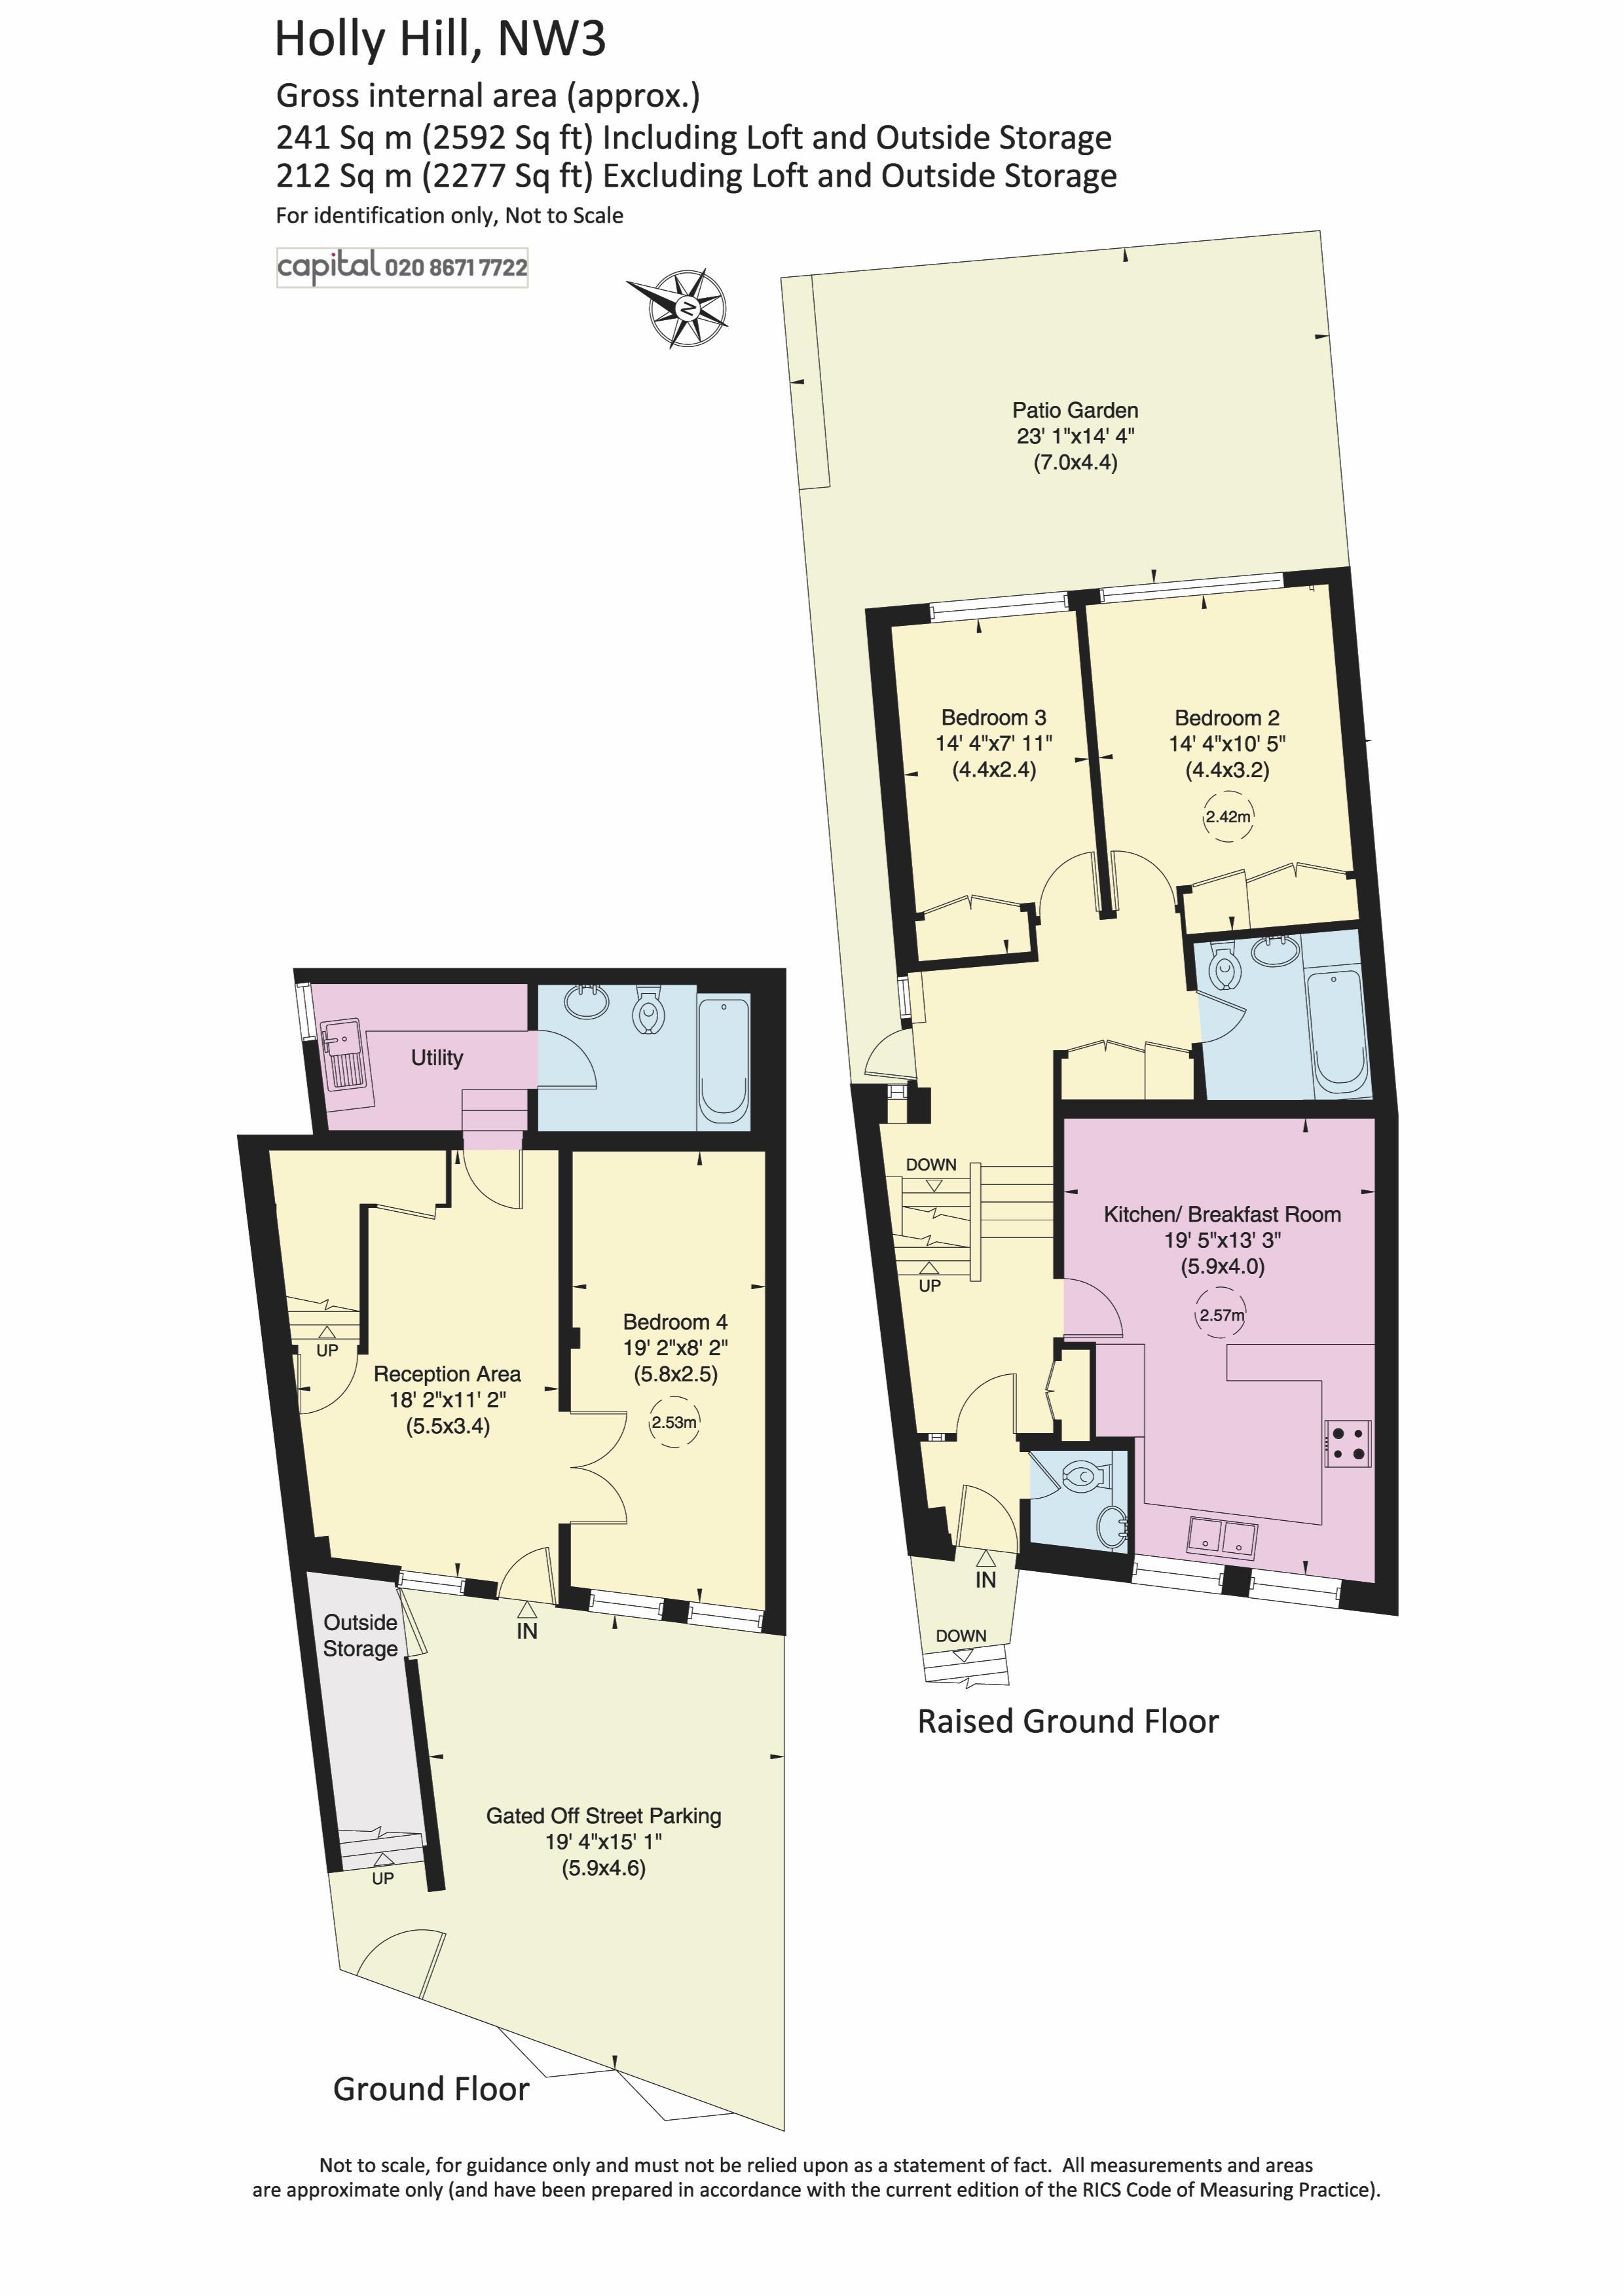 Raised and Ground Floor Plan